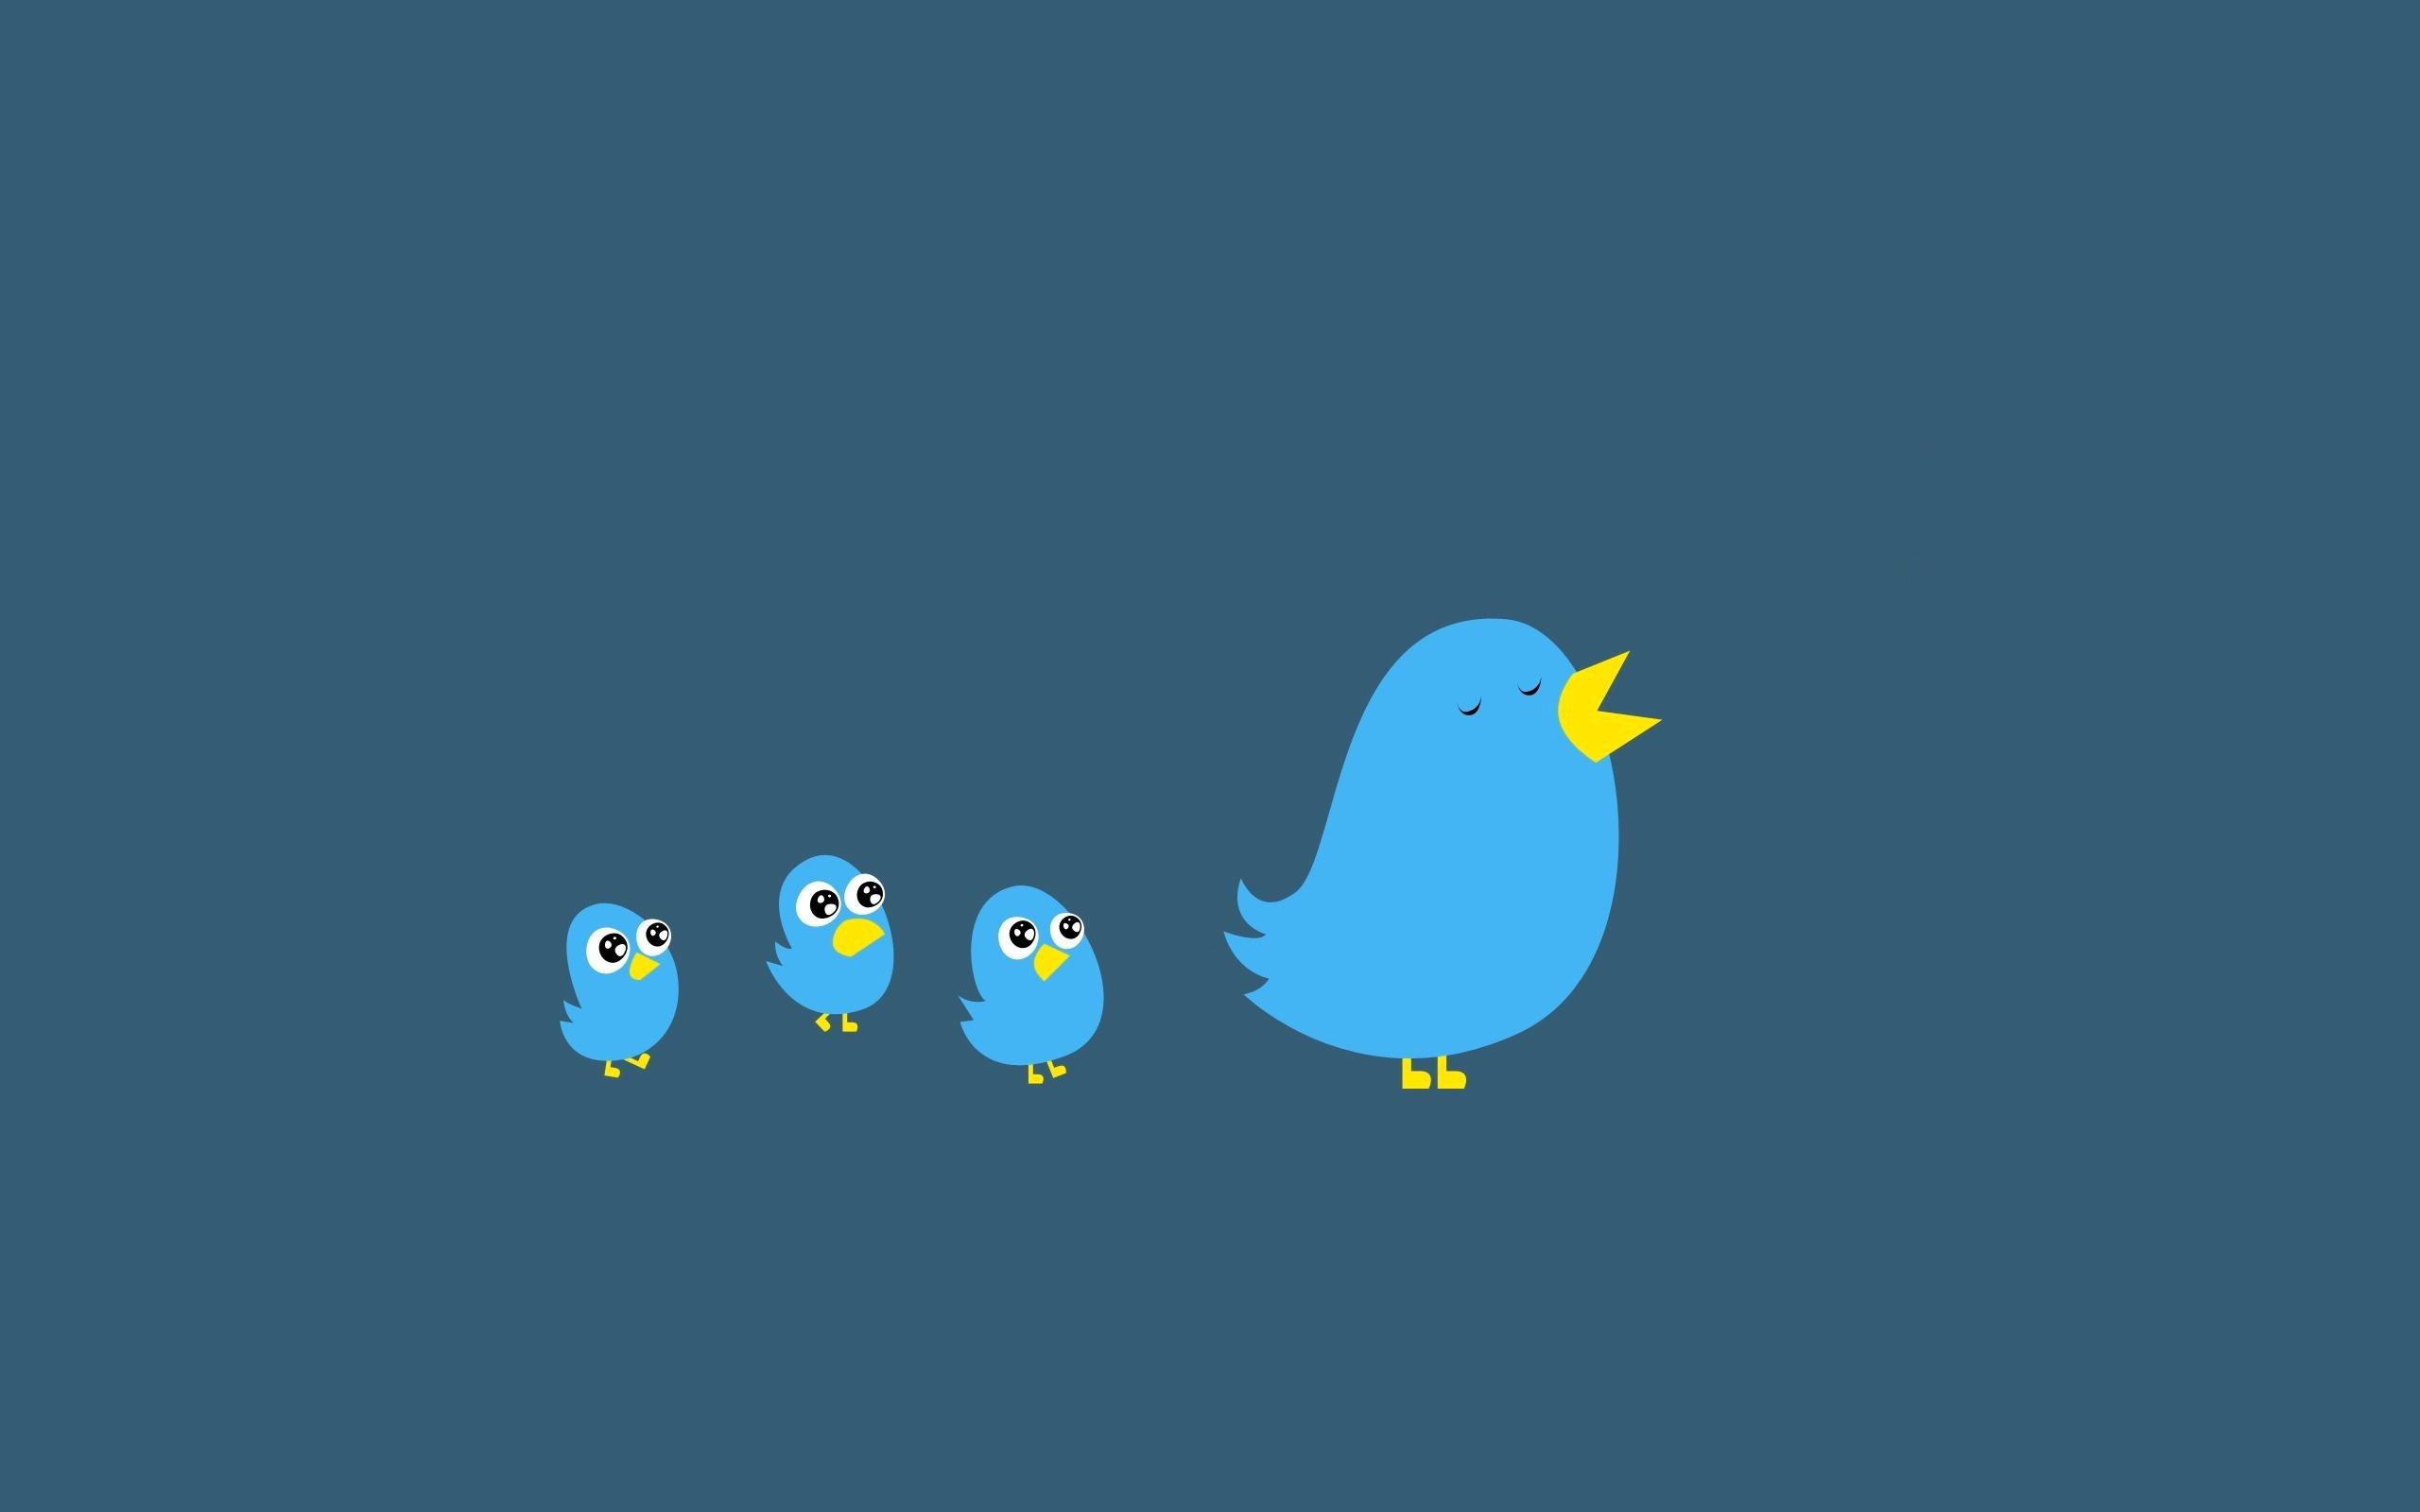 Twitter Hd Wallpaper Background Image 2560x1600 Id